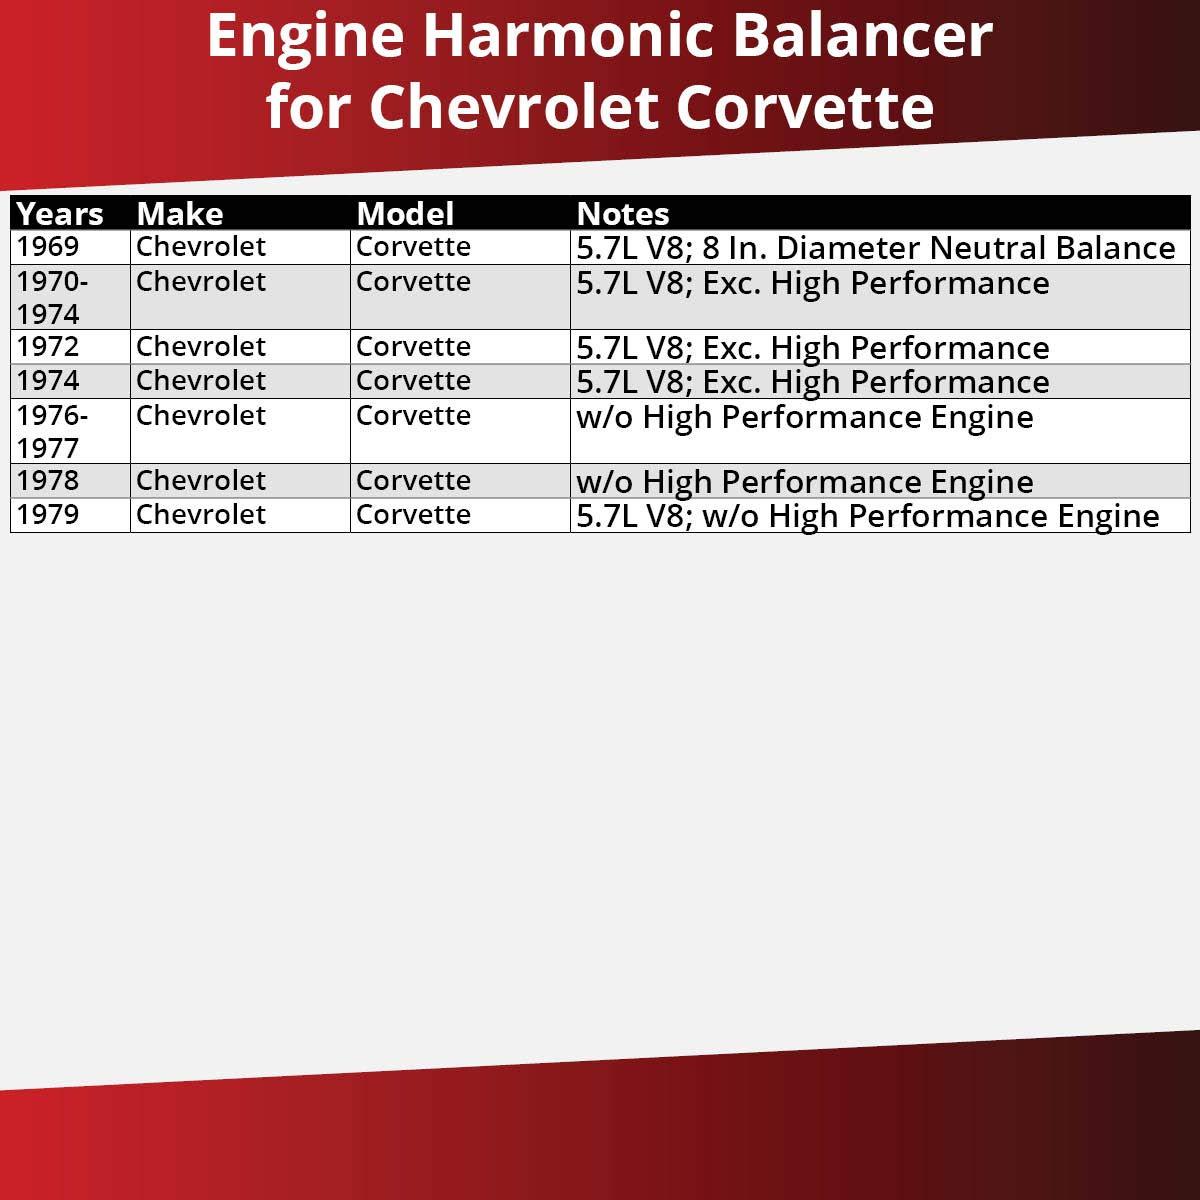 Engine Crankshaft Damper Dayco Harmonic Balancer for 1969-1979 Chevrolet Corvette 5.7L V8